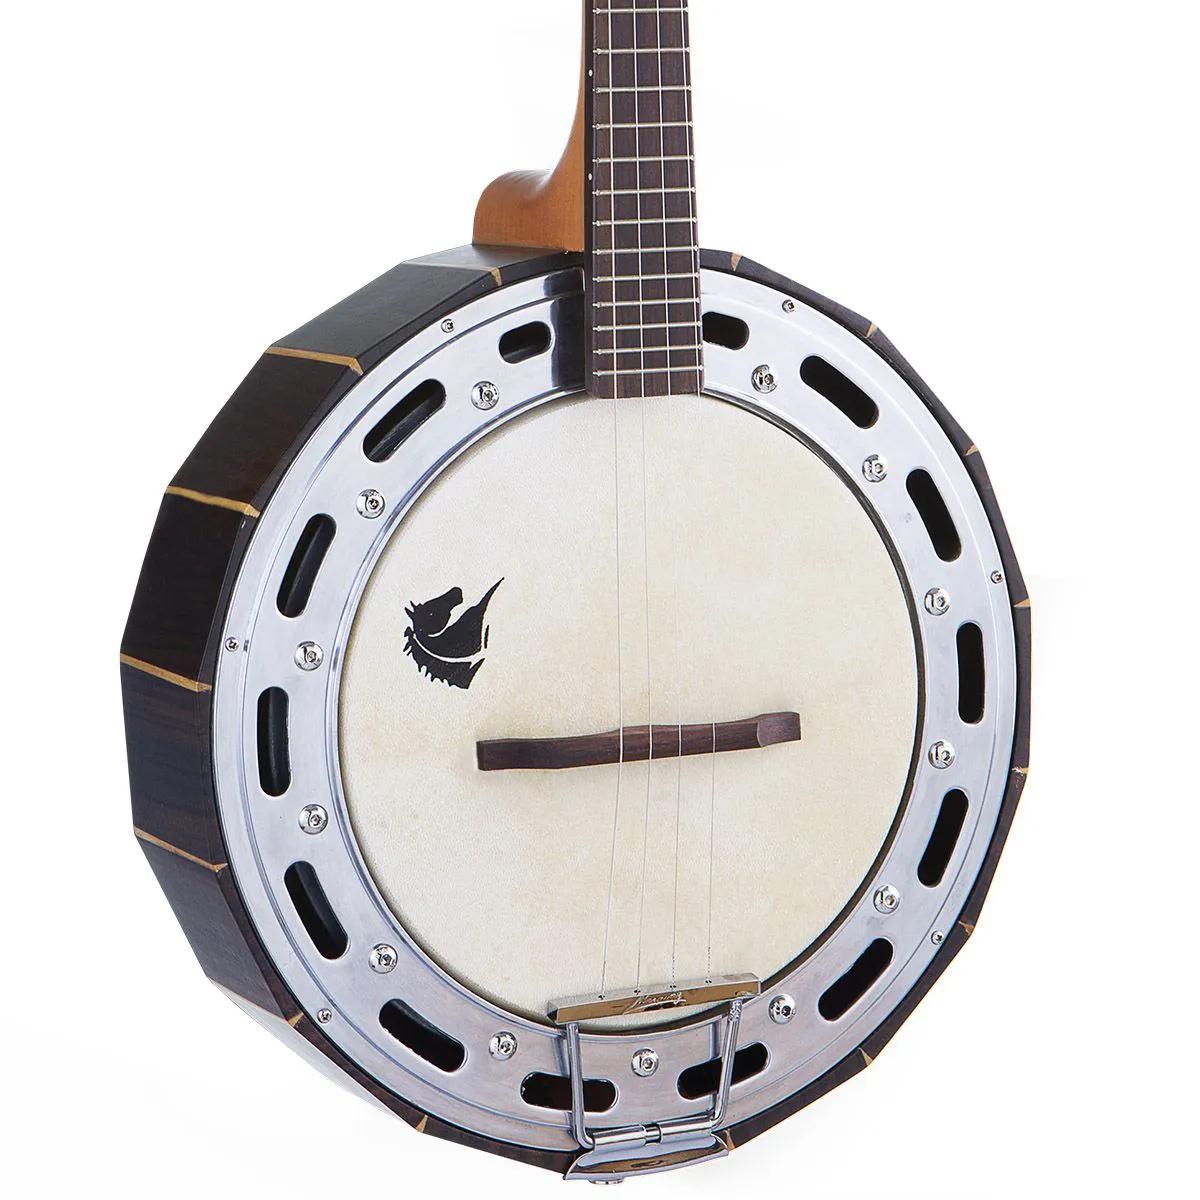 Banjo Jacarandá Eletro-Acústico Marquês BAJ-99 Passivo NT